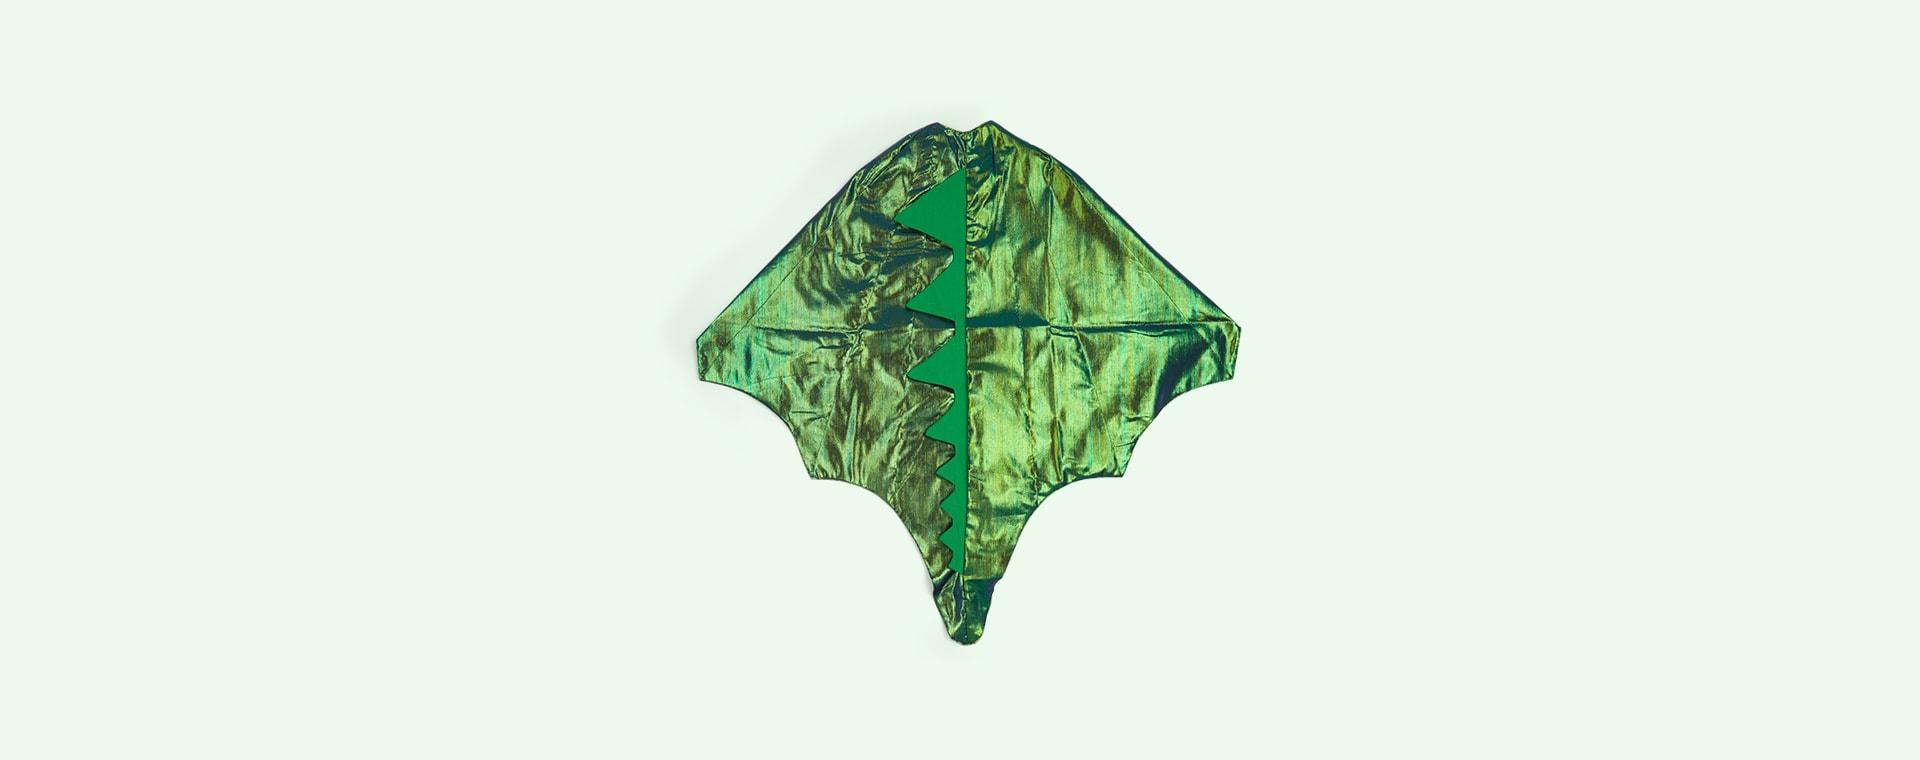 Green Meri Meri Dragon Cape Dress Up